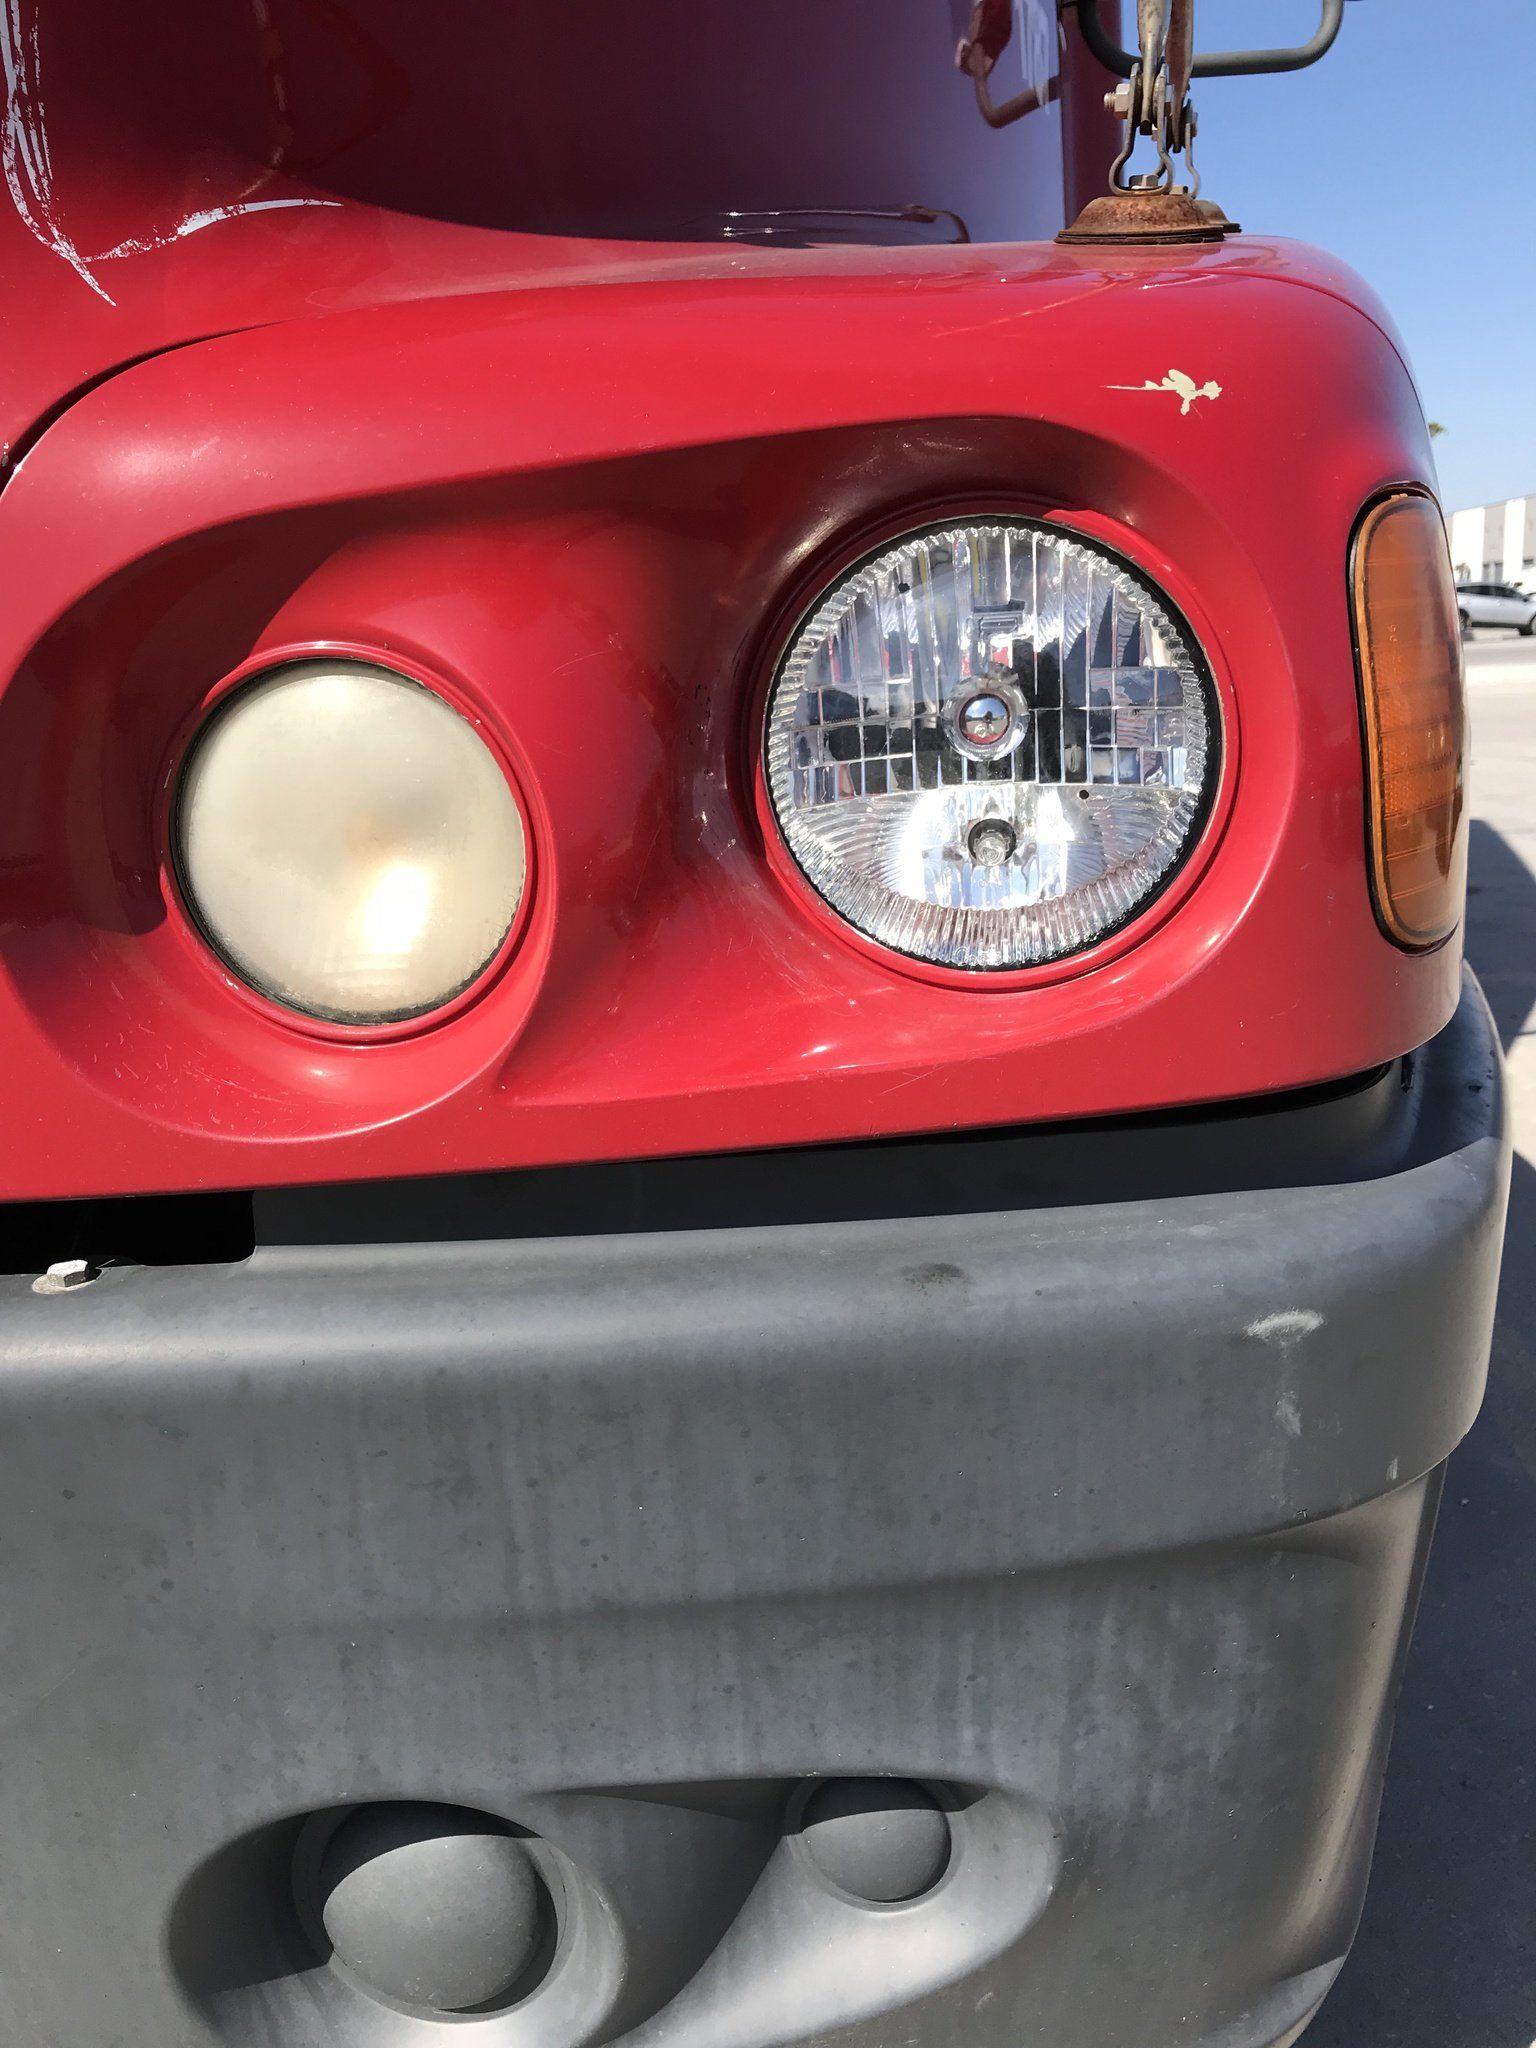 Freightliner Century Driver Passenger Side Replacement Headlight Assembly 2005 Replacement Headlights Freightliner Headlight Assembly